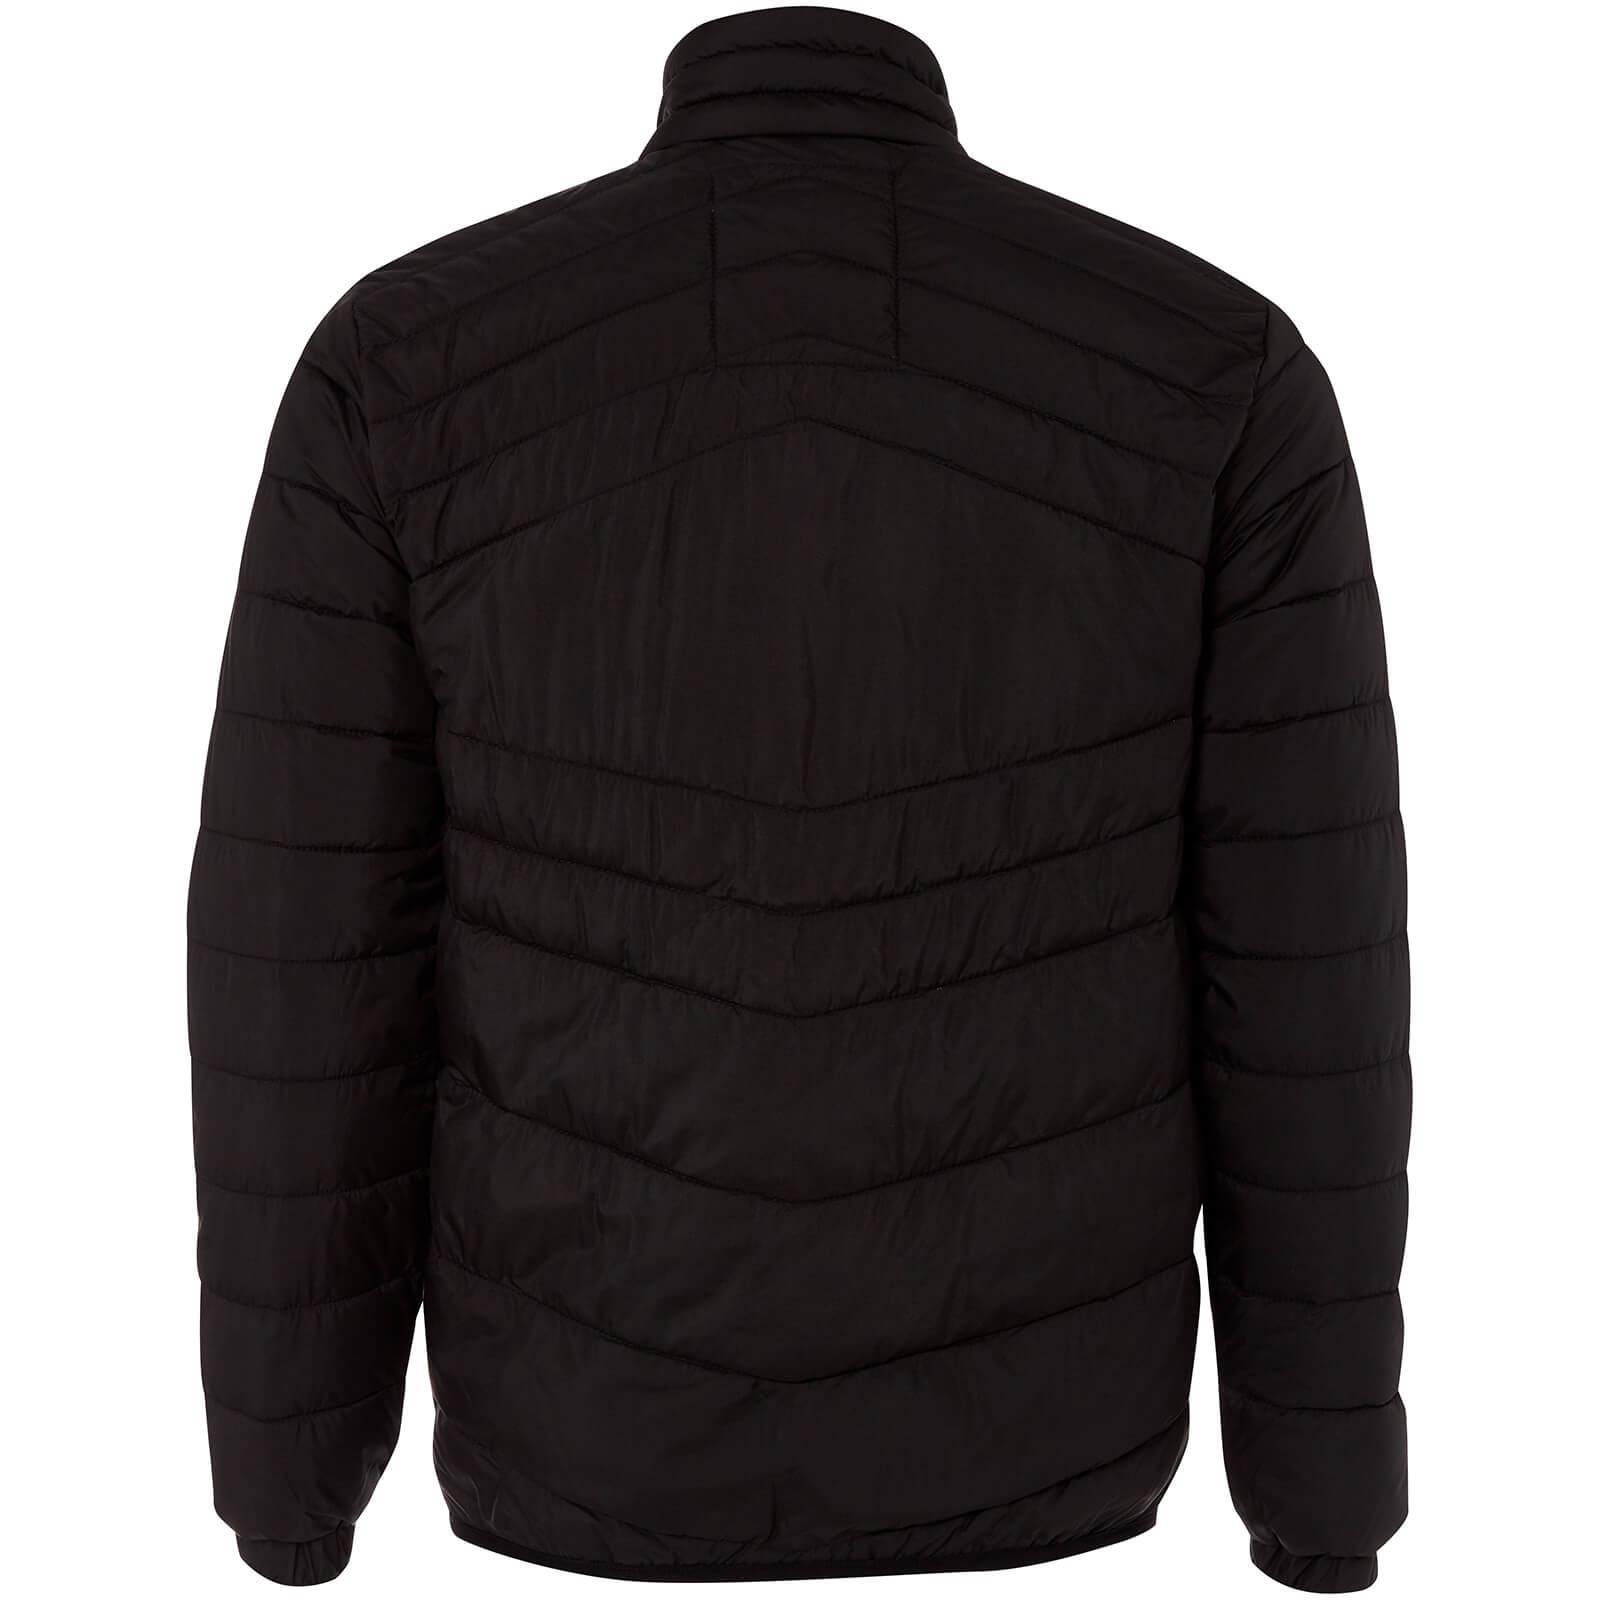 Jack & Jones Synthetic Originals New Landing Padded Jacket in Black for Men